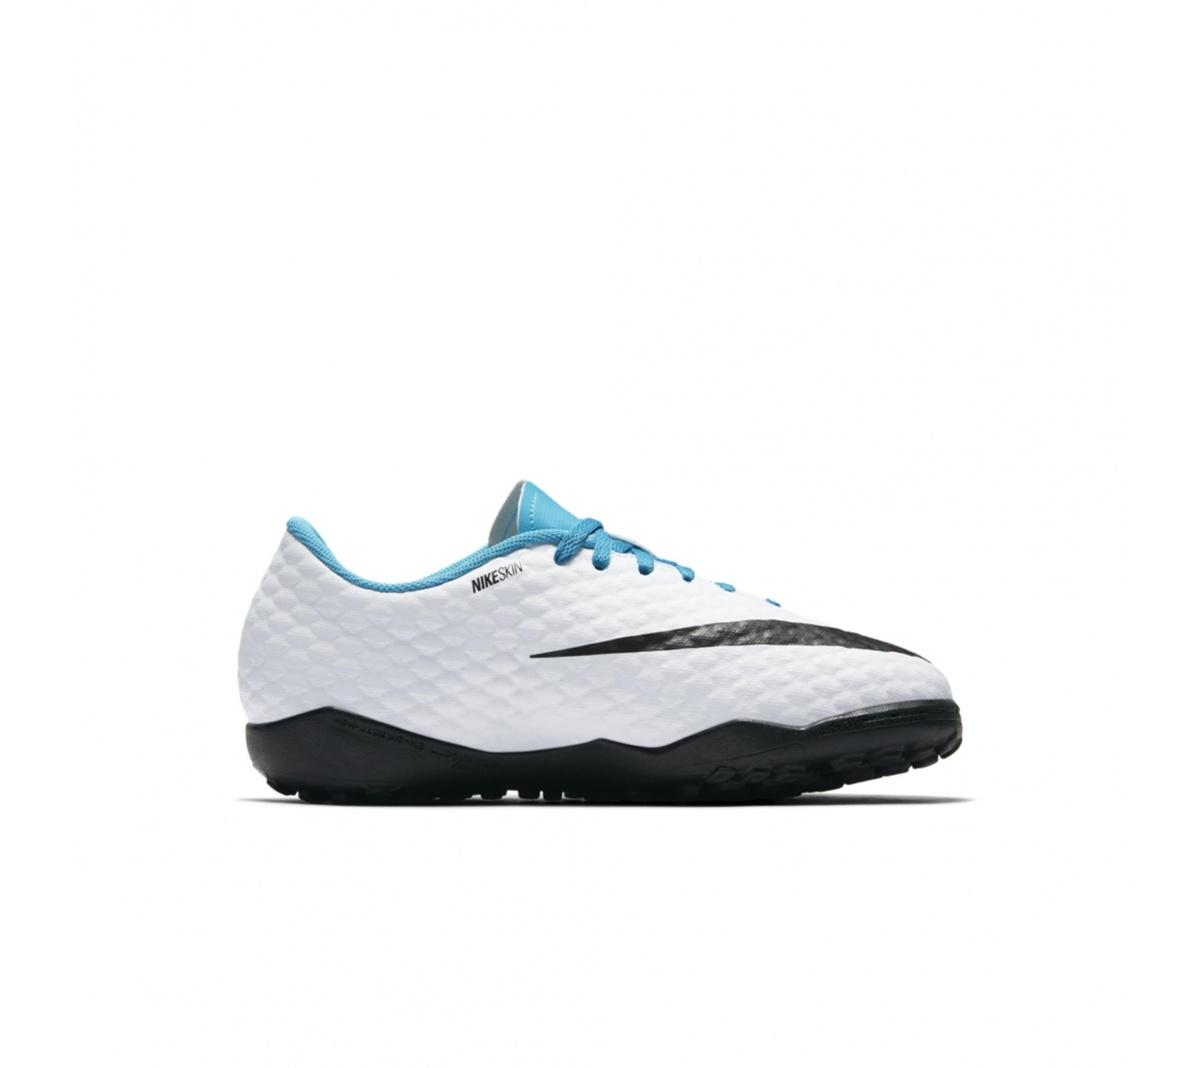 Chuteira Nike HypervenomX Phelon III TF Infantil Azul e Branco ... 4078d3736d8f1